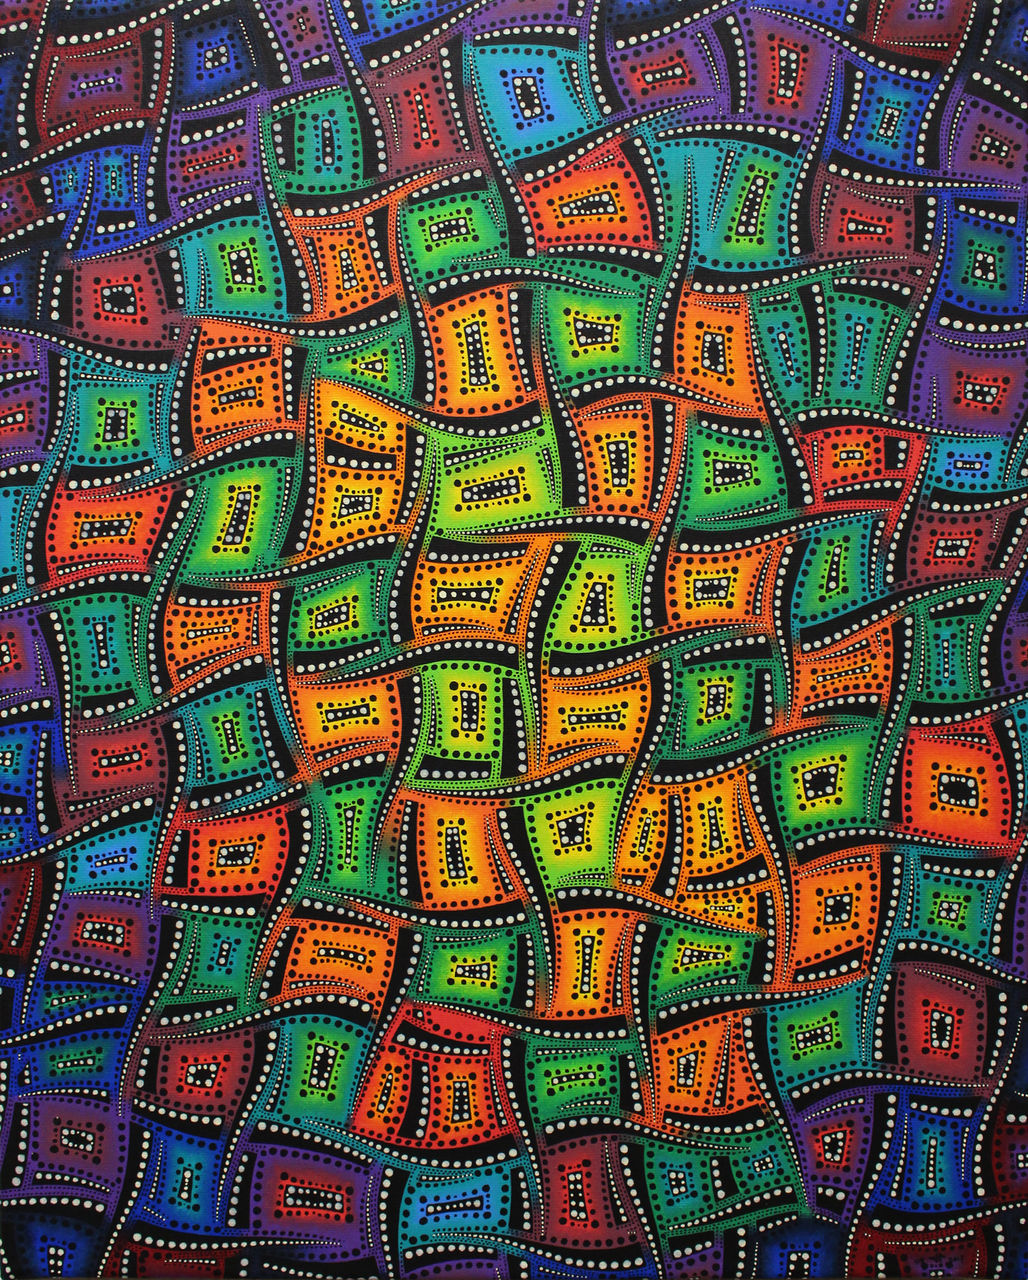 Jonathan-Pradillon Mouvements de couleurs mixtes